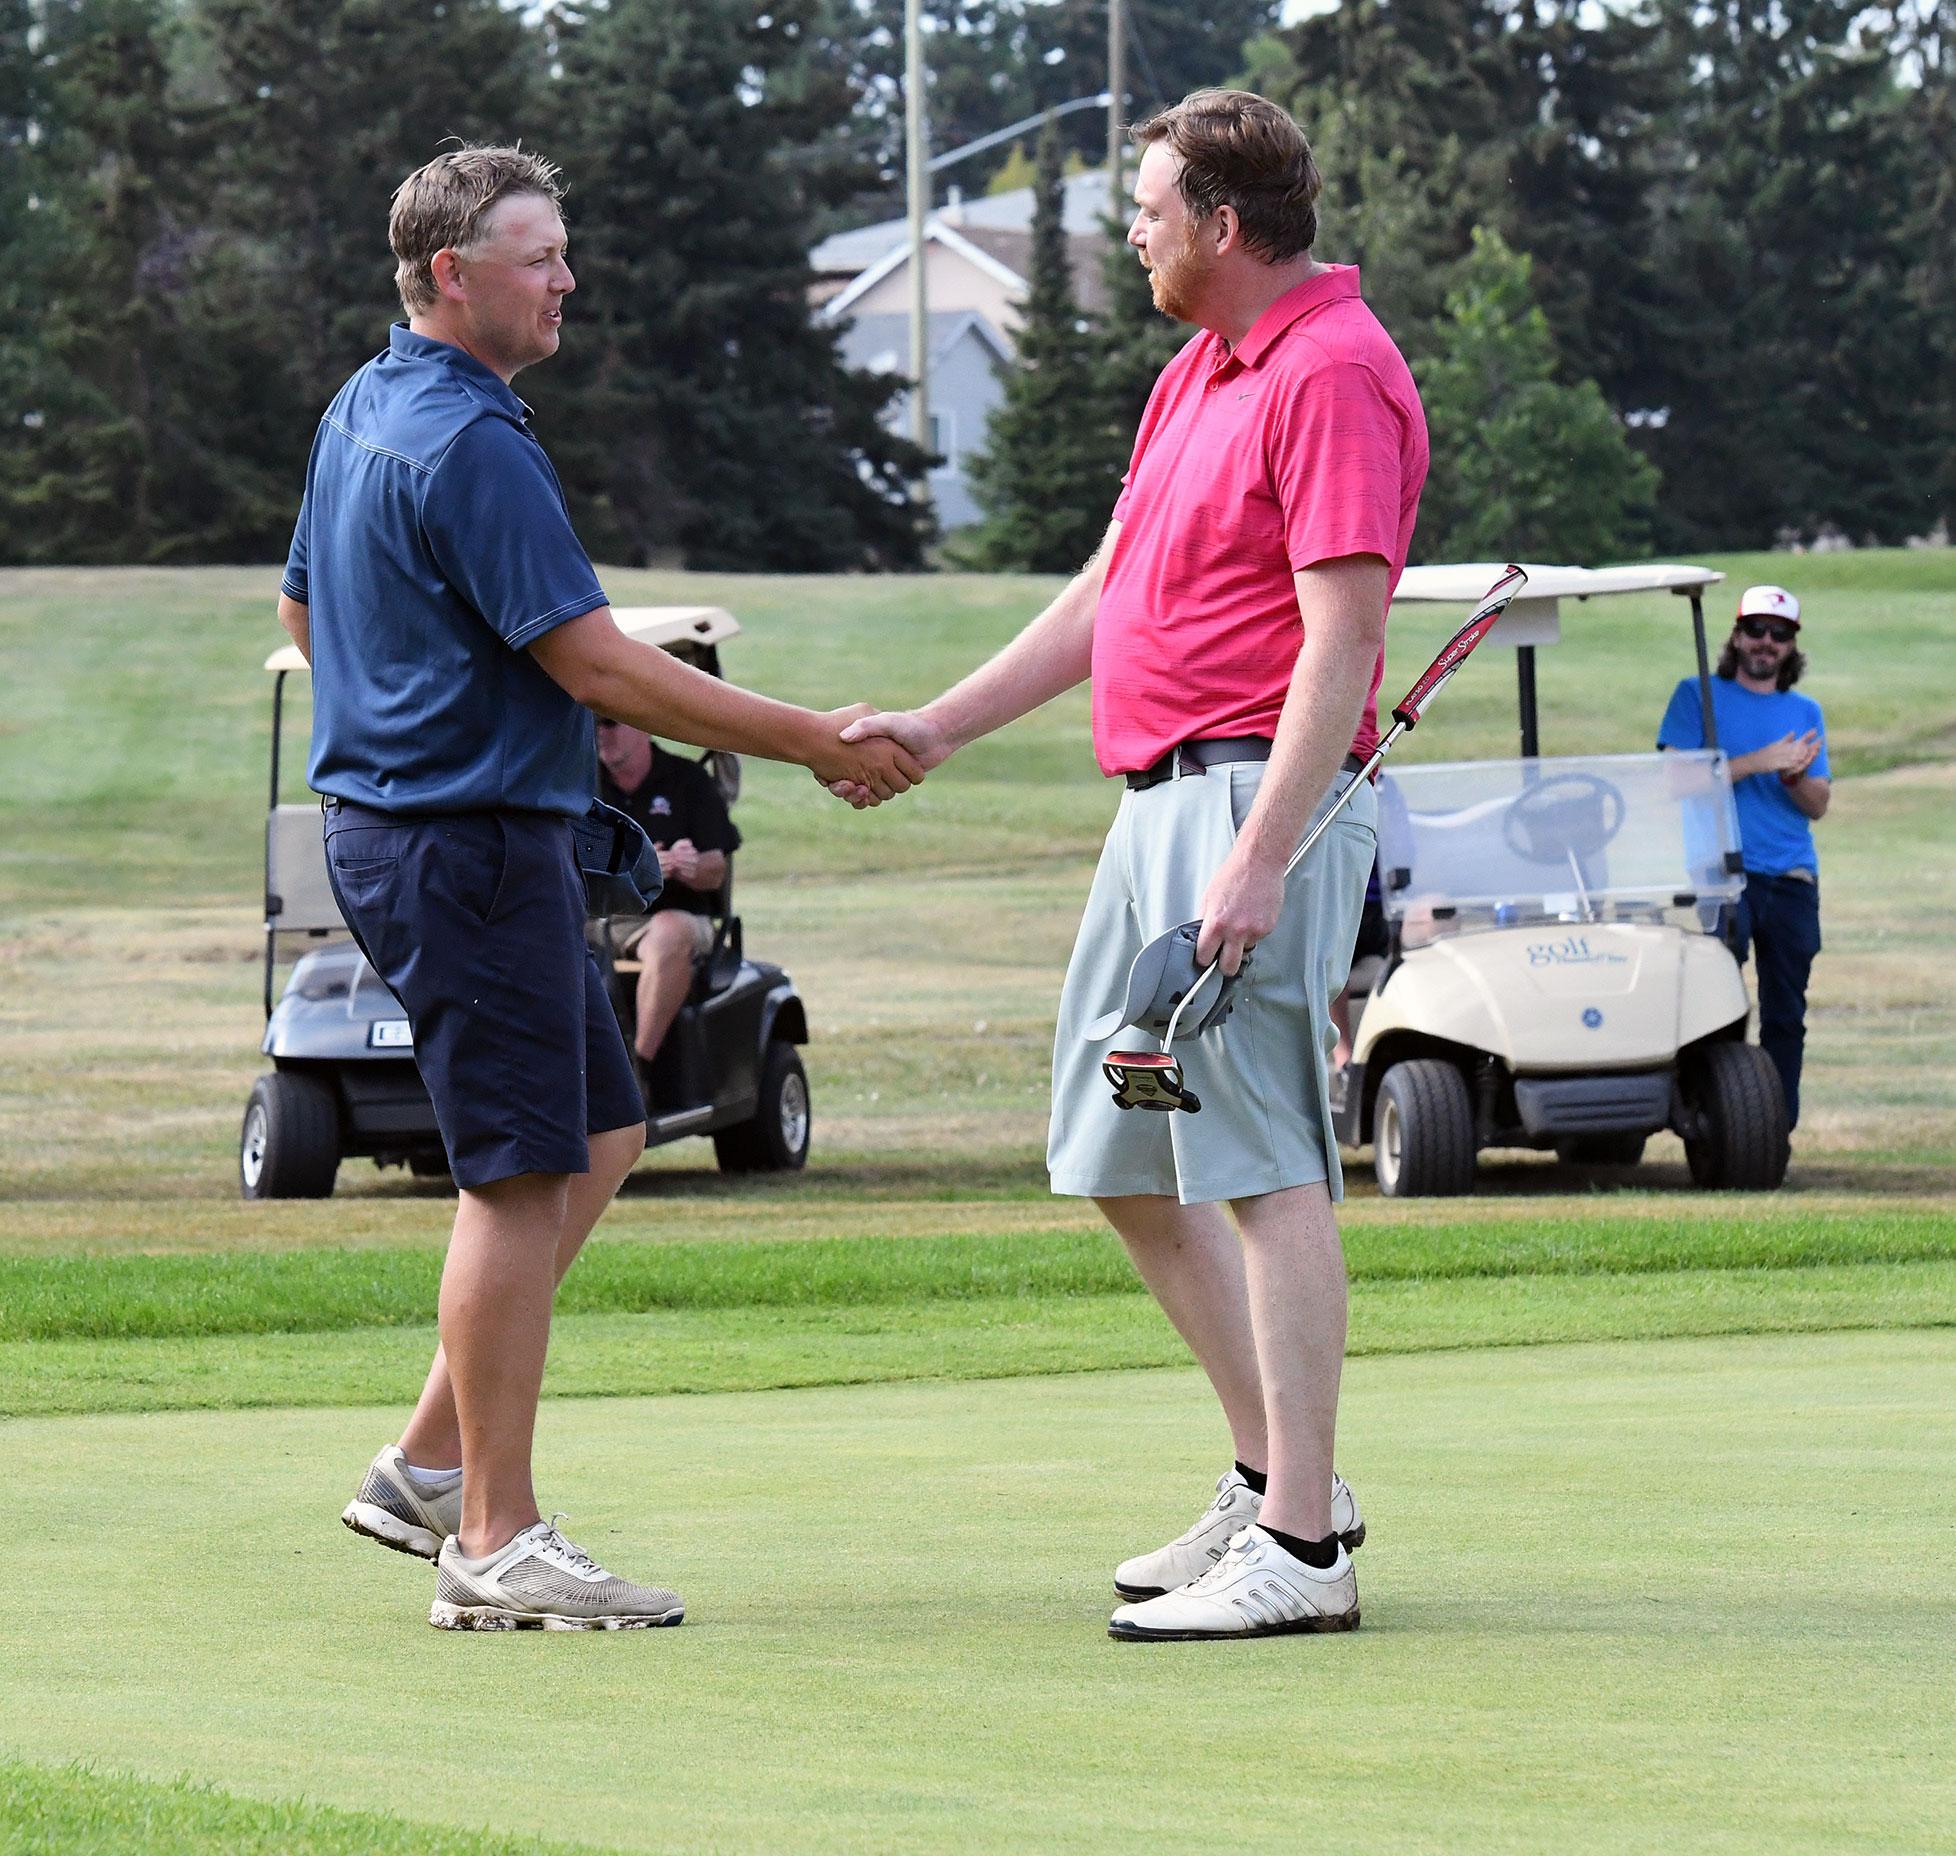 Scott Wilke and Robert Cumming shaking hands.